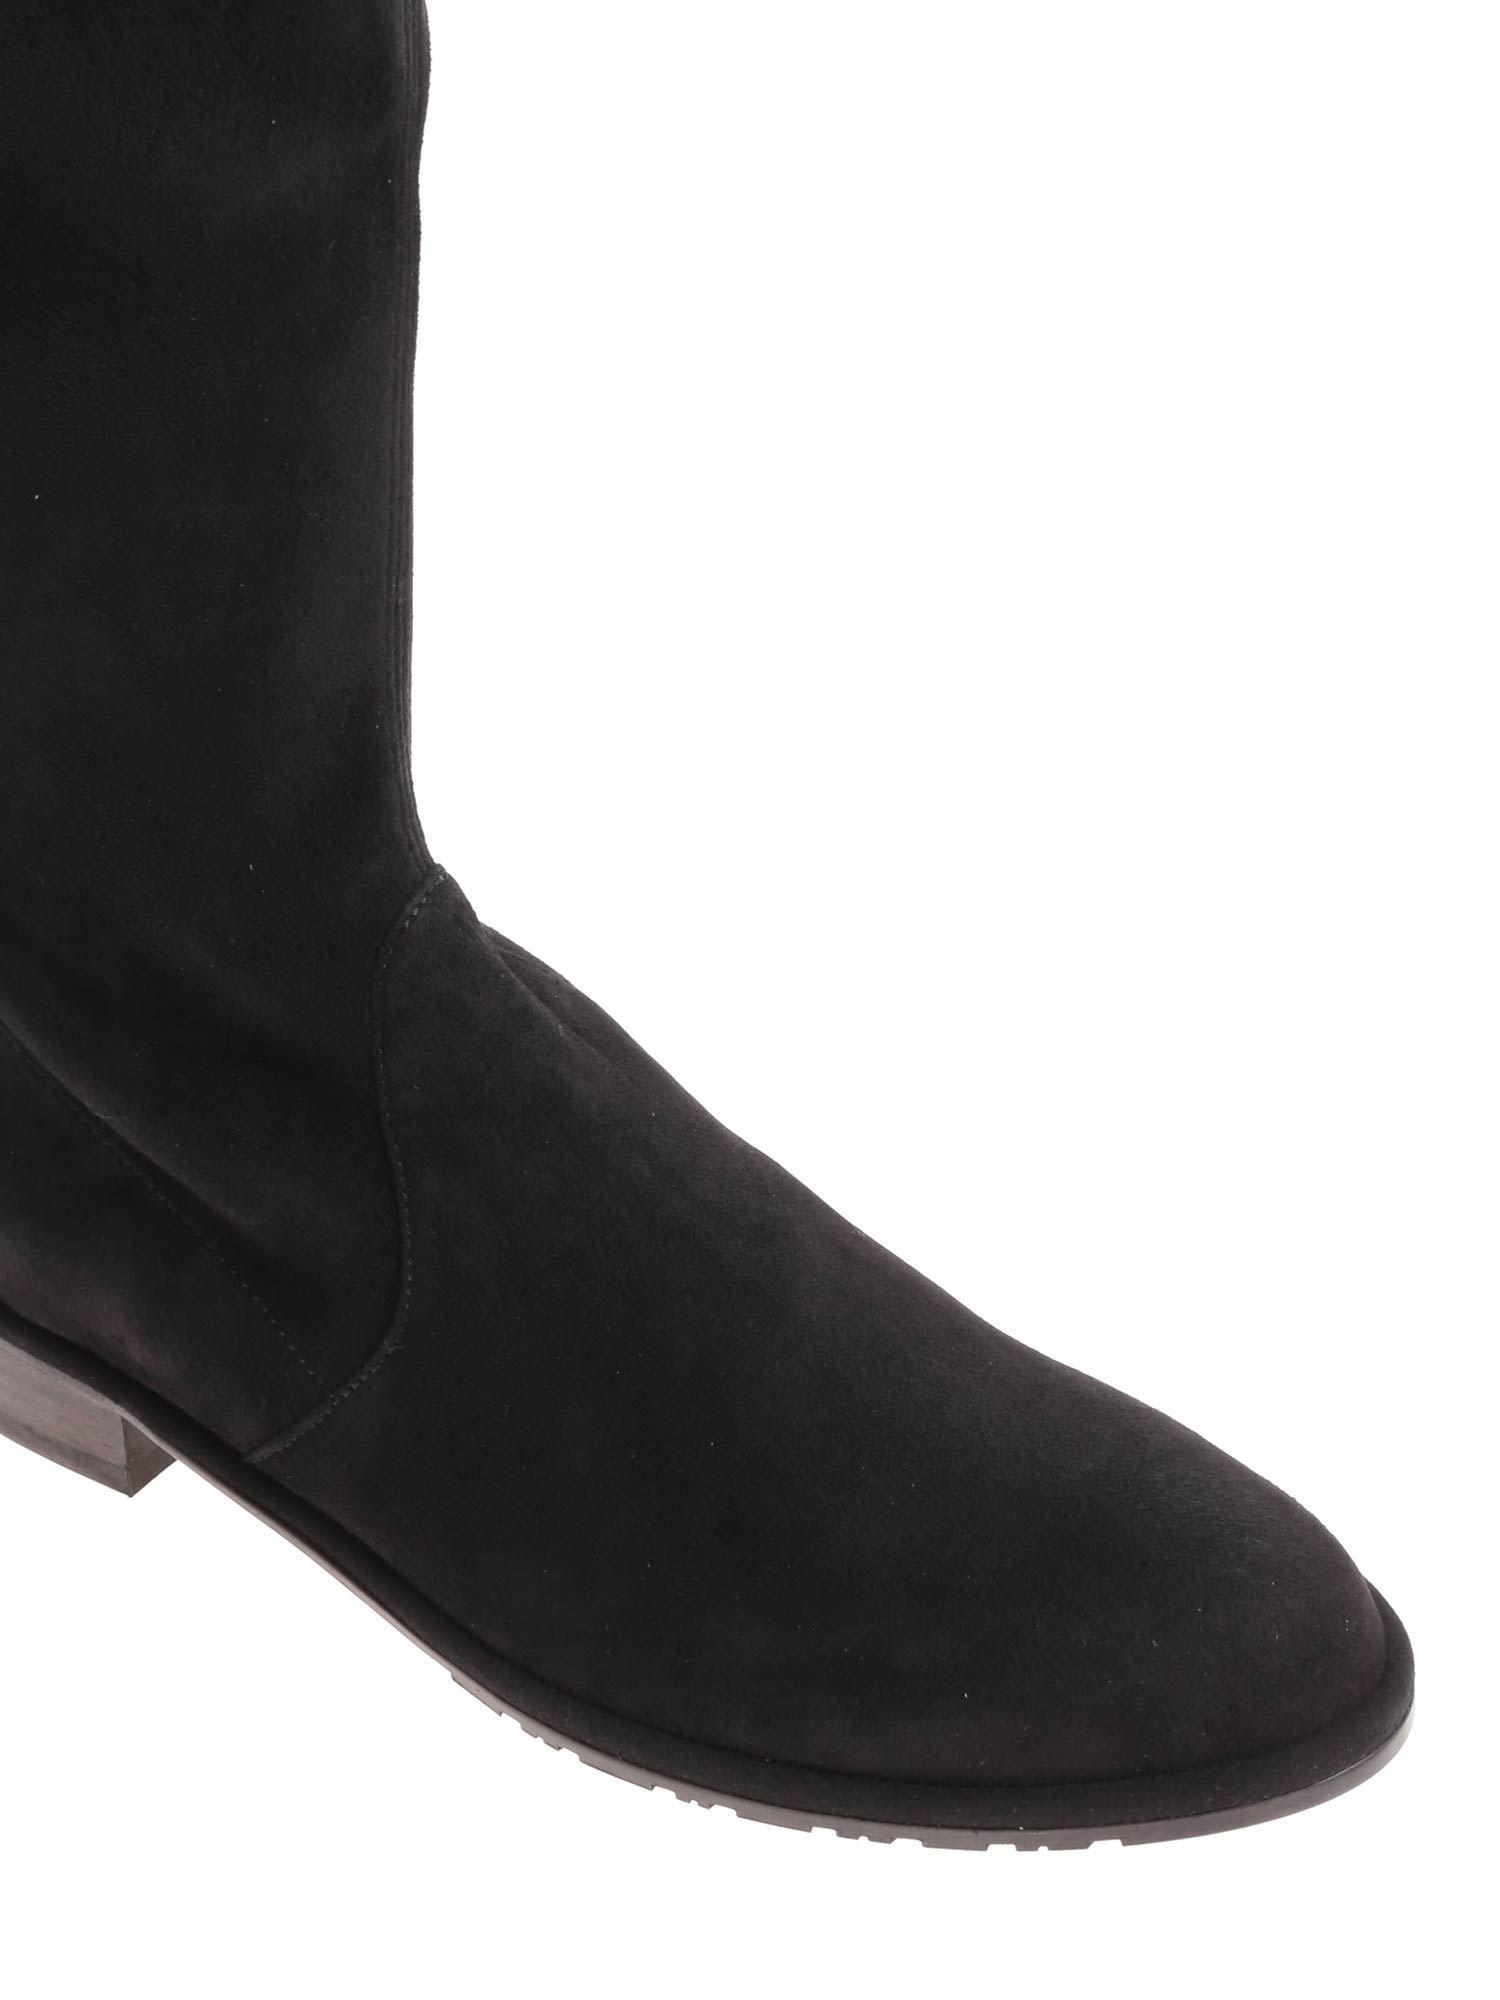 Stuart Weitzman Suede Black Lowland Boots